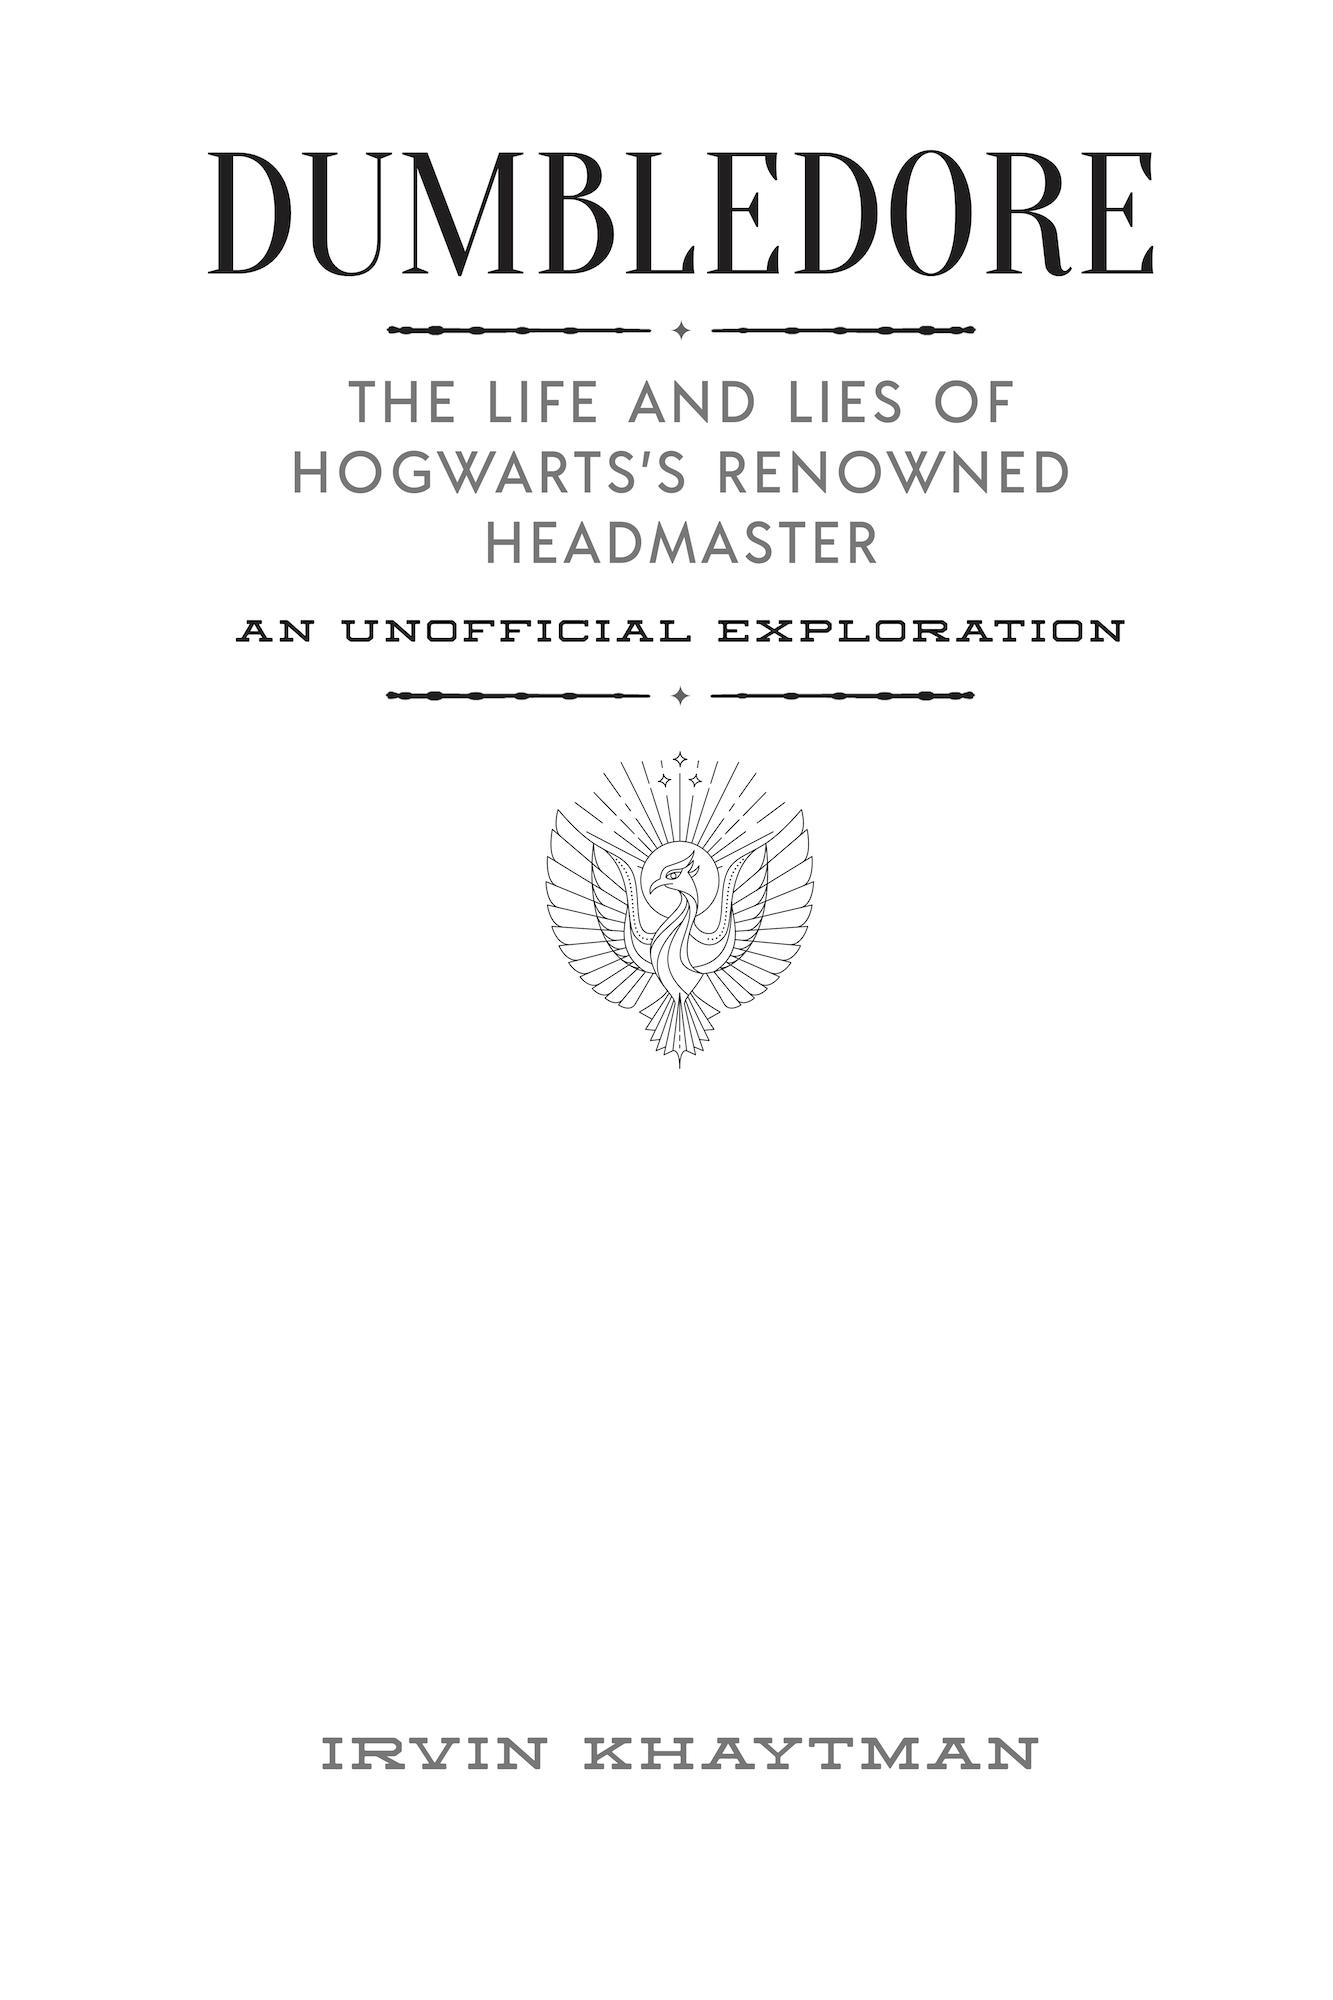 Dumbledore Life Lies title